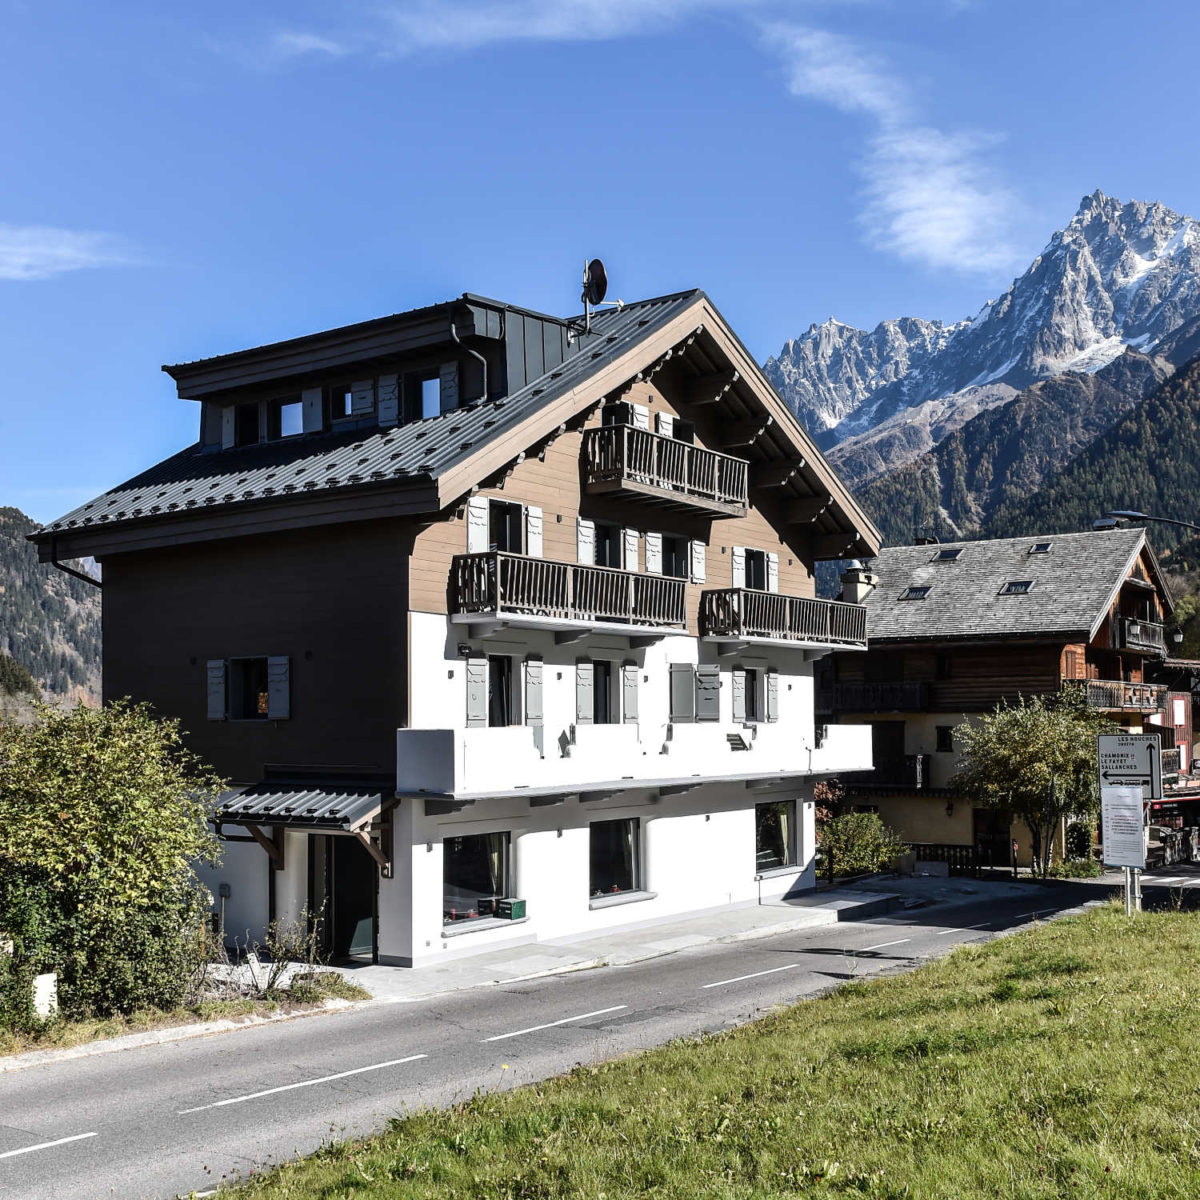 https://chevallier-architectes.fr/content/uploads/2018/01/Hôtel-Slalom65-1200x1200.jpg